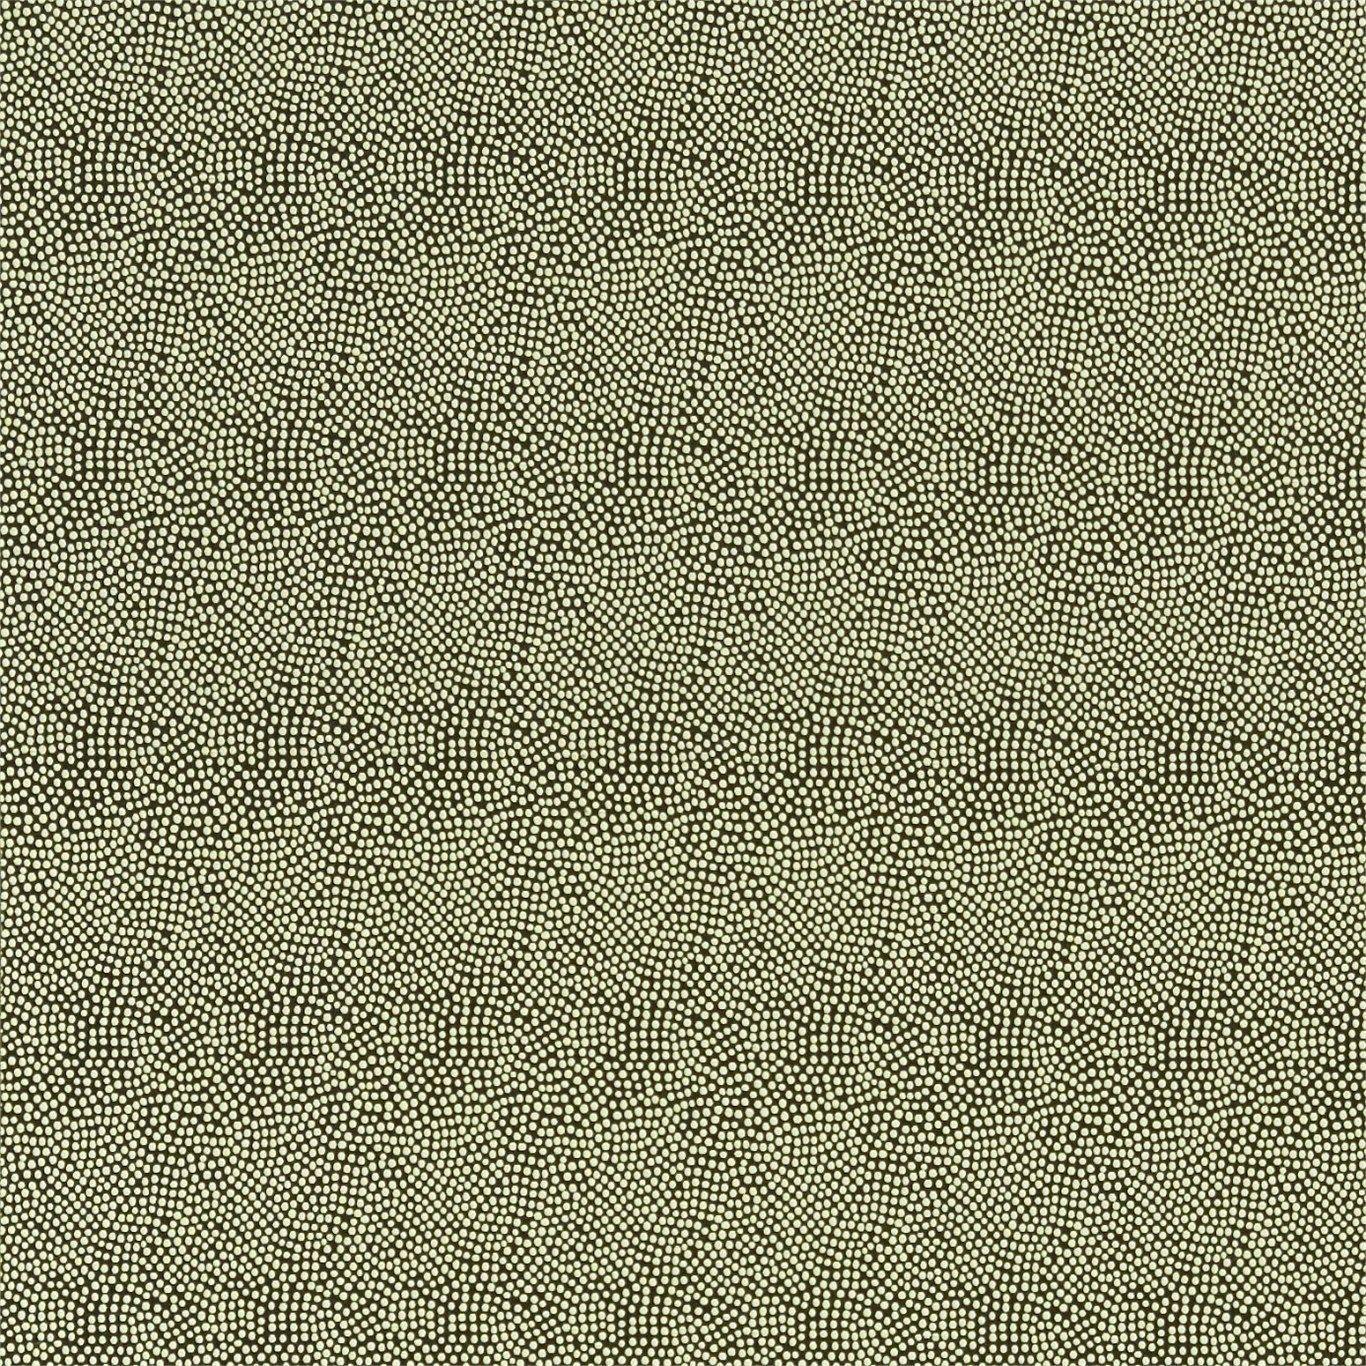 Henna Wallpaper: Henna Wallpapers